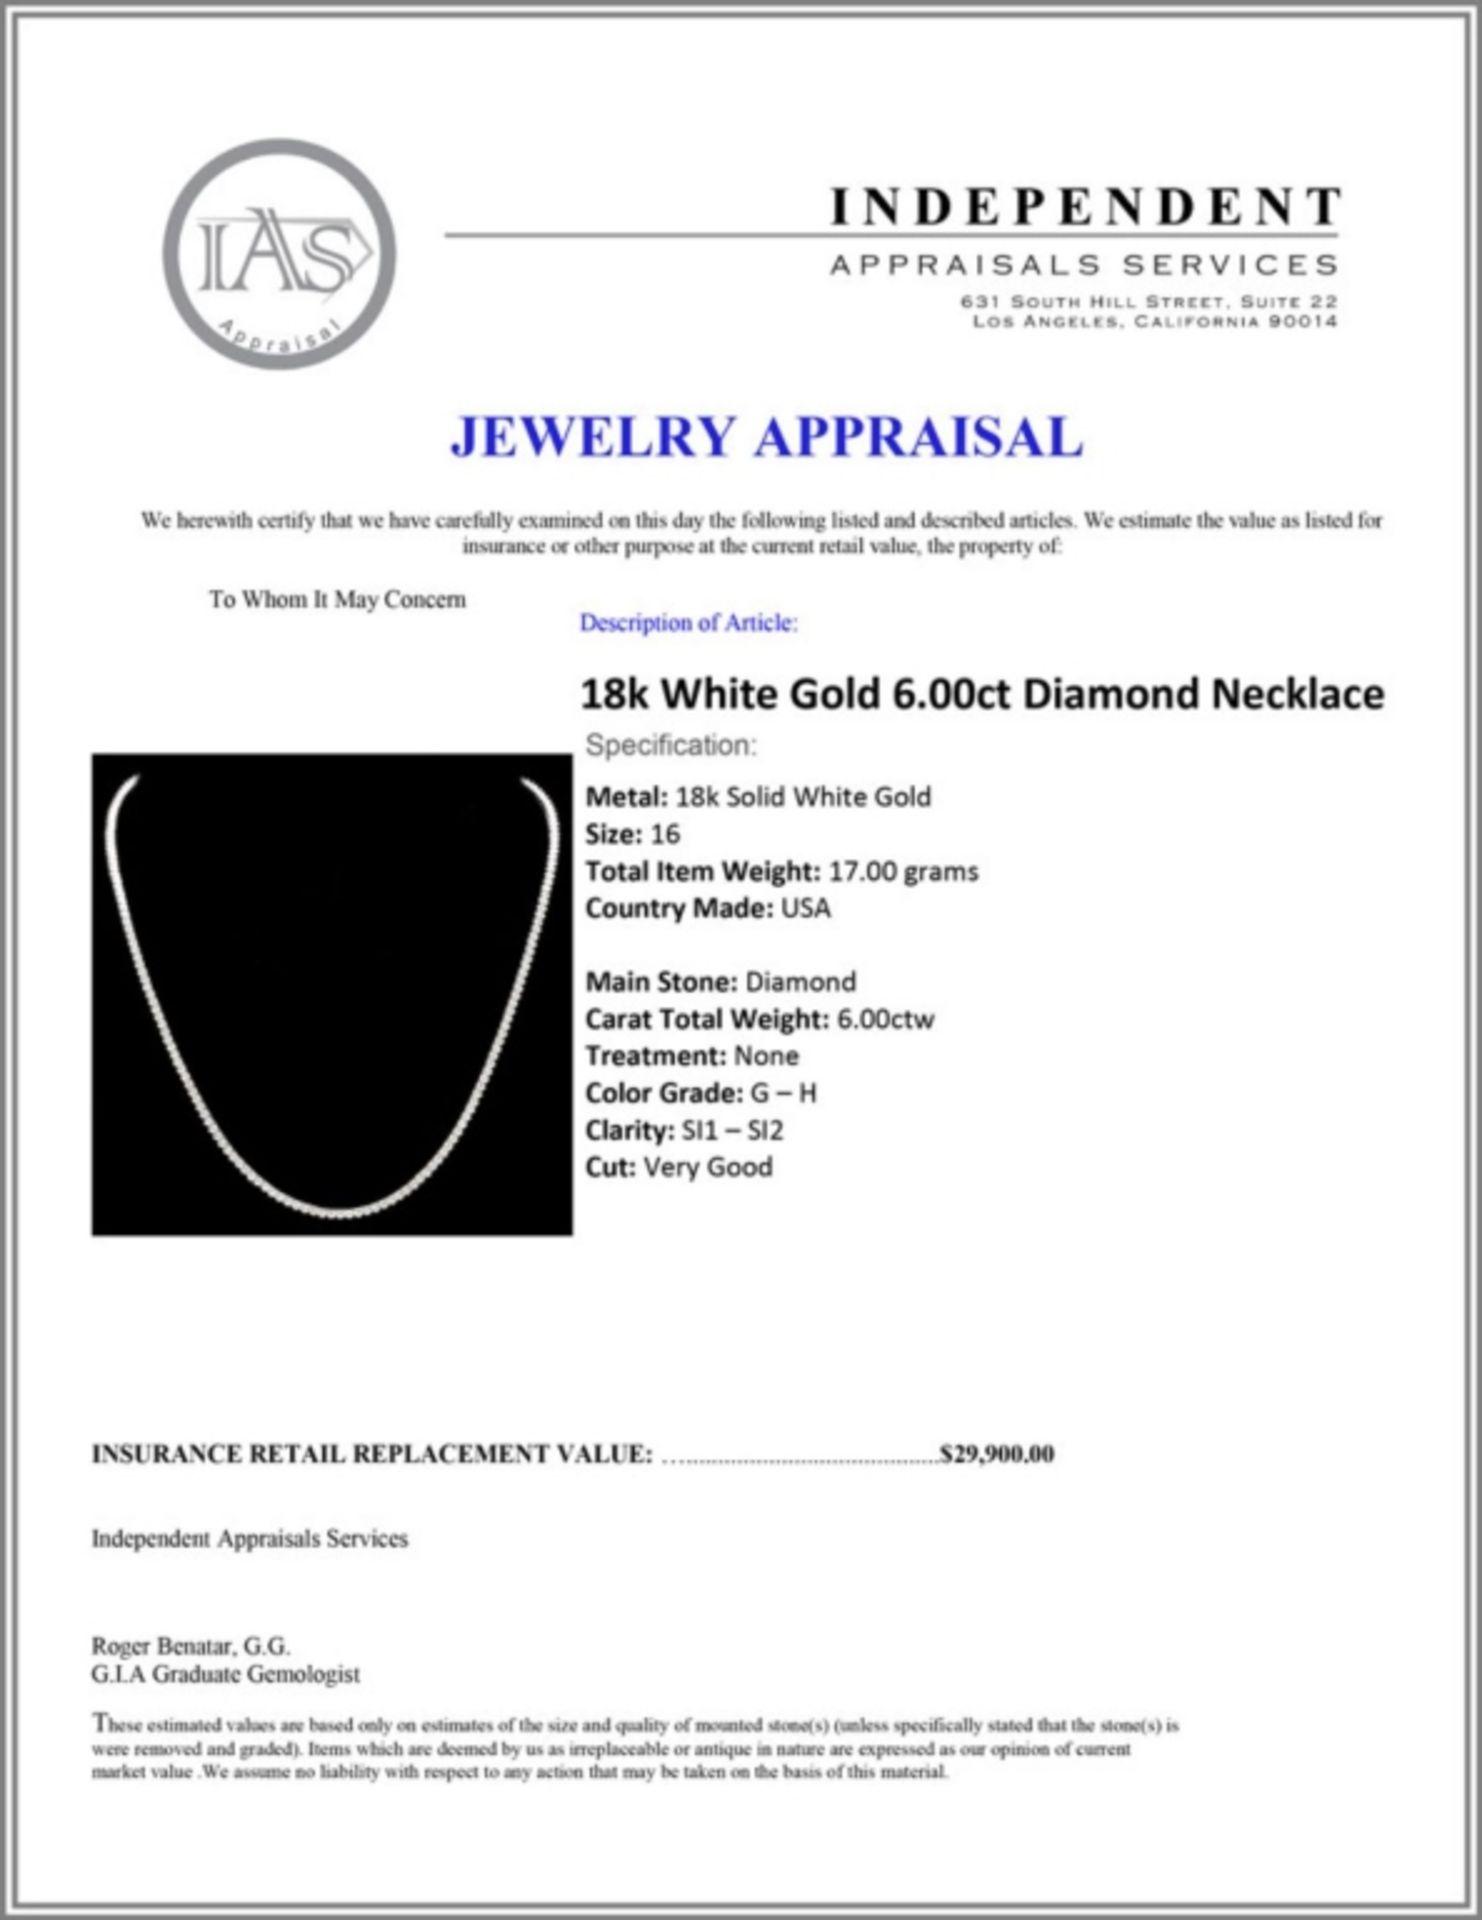 ^18k White Gold 6.00ct Diamond Necklace - Image 3 of 3